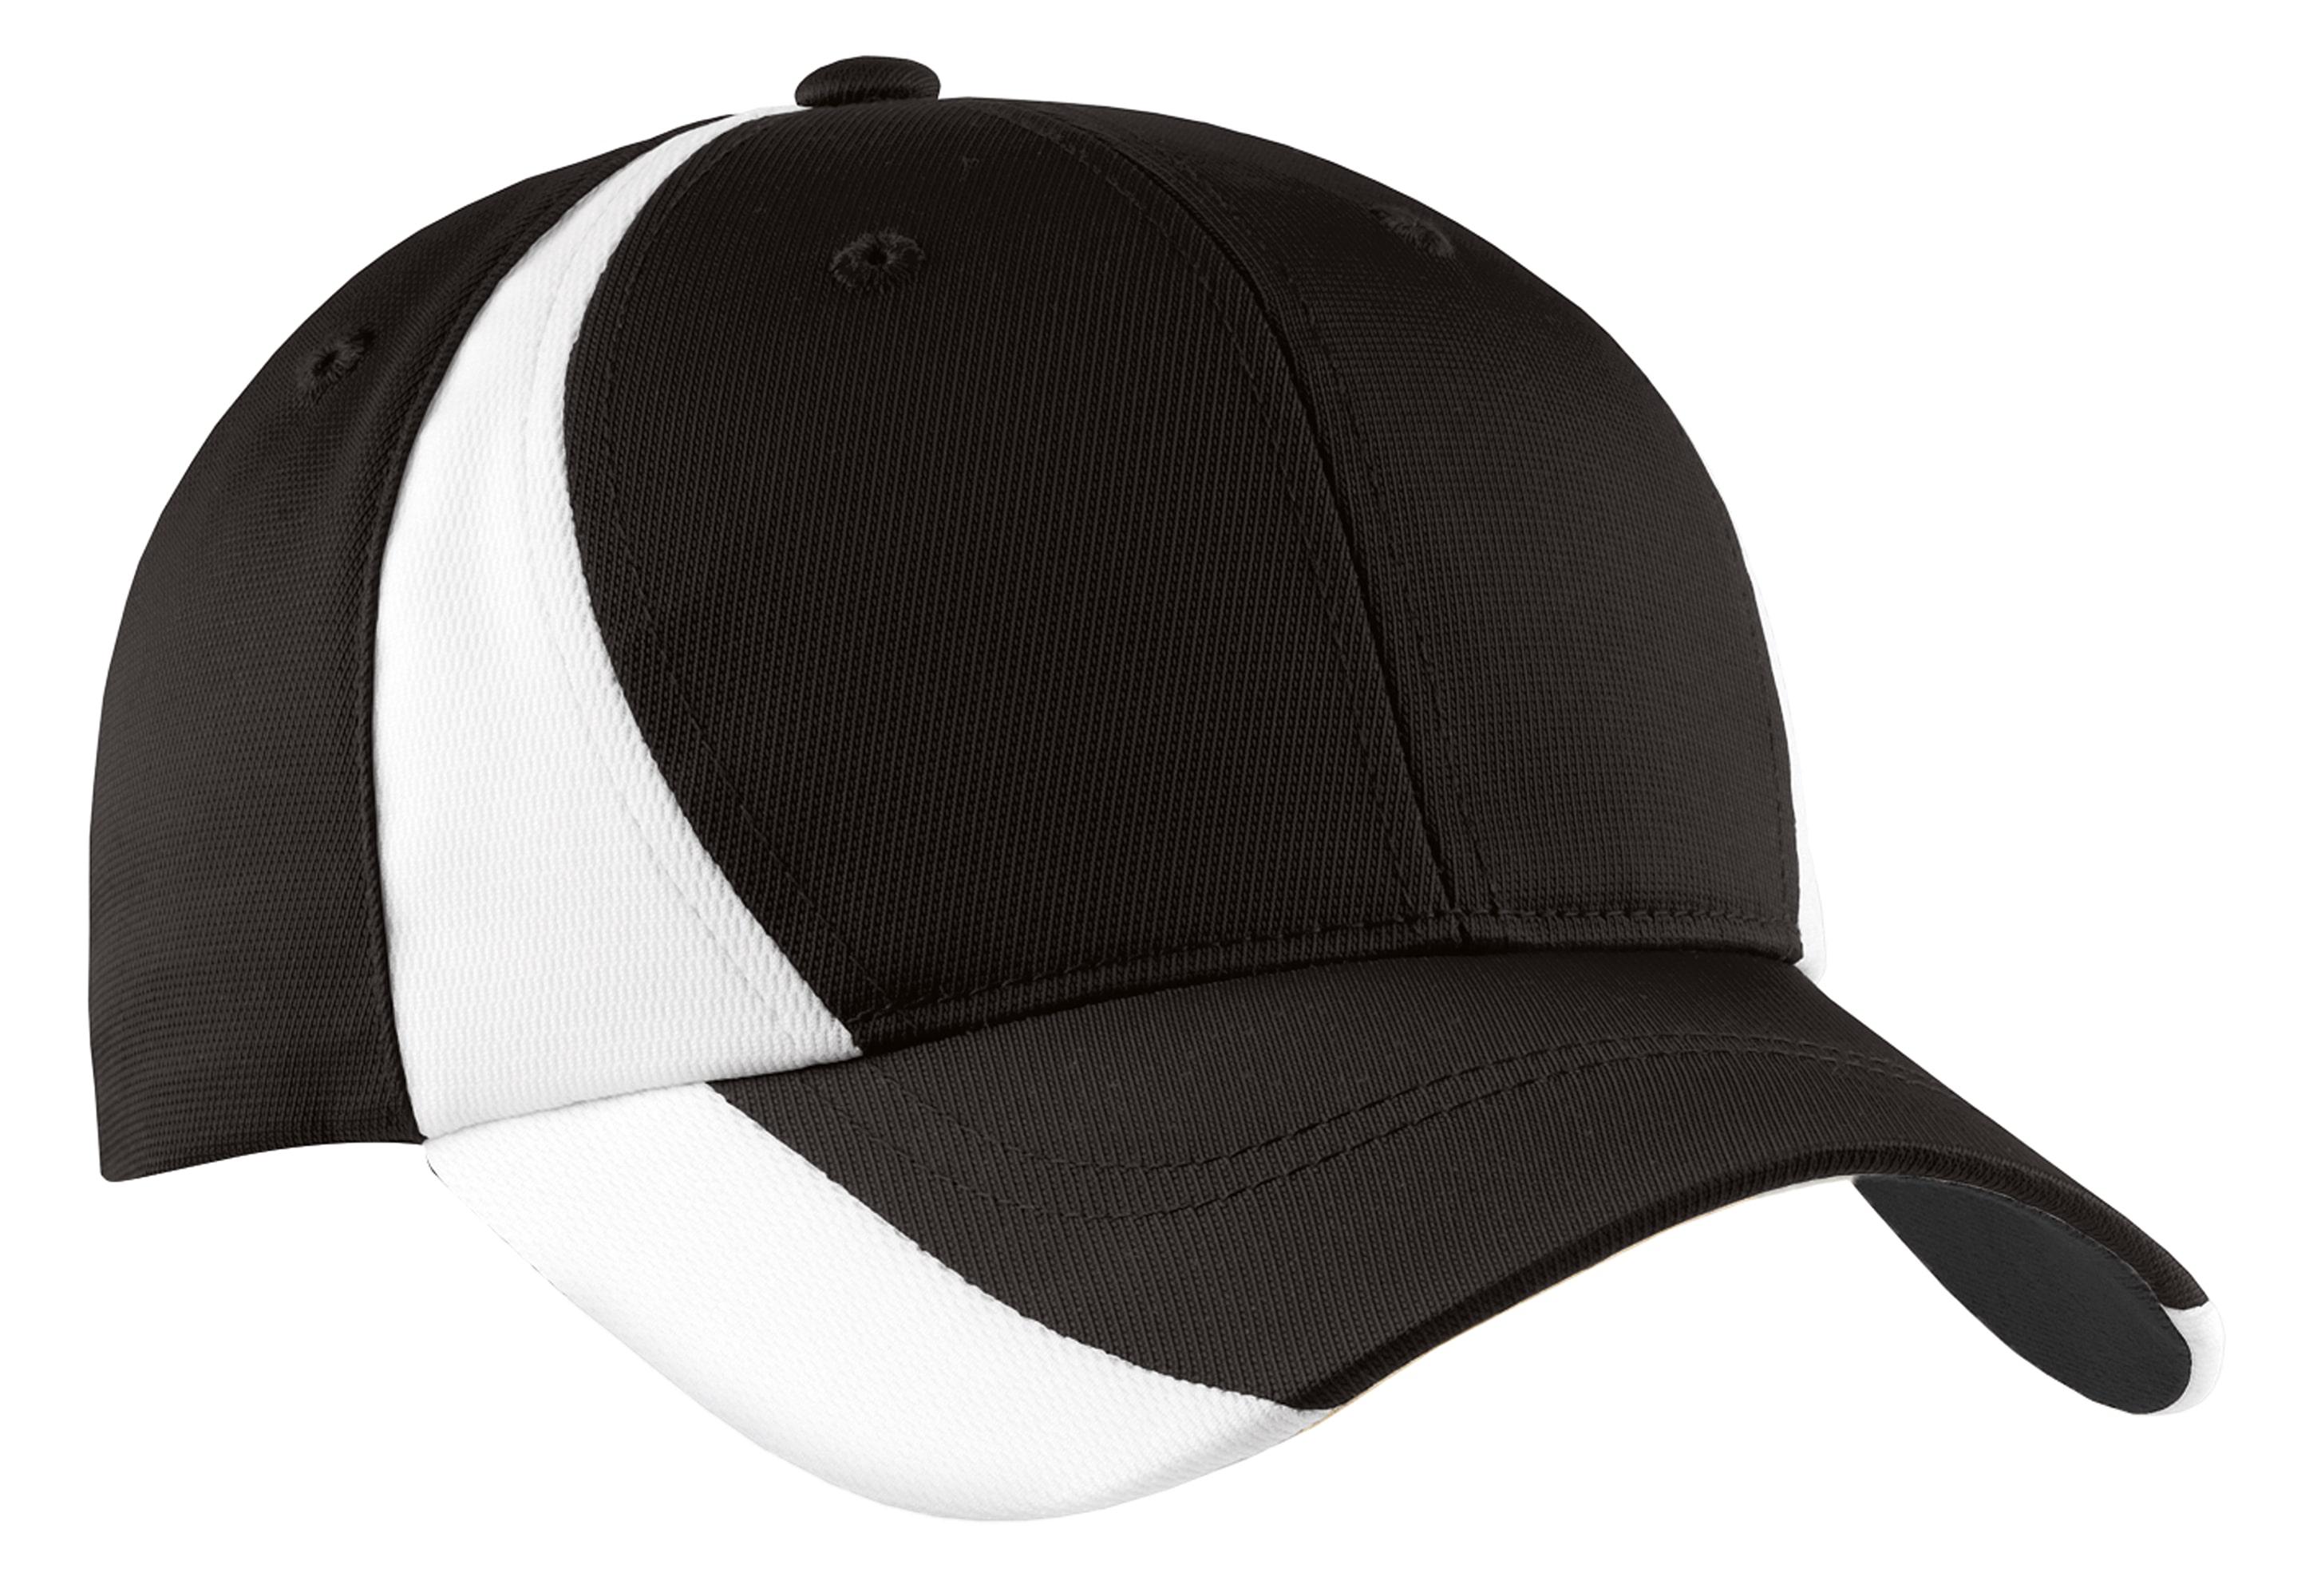 Stc11 Sport Tek Dry Zone Nylon Colorblock Cap Browse all hats for baseball, basketball, football, golf and more. stc11 sport tek dry zone nylon colorblock cap